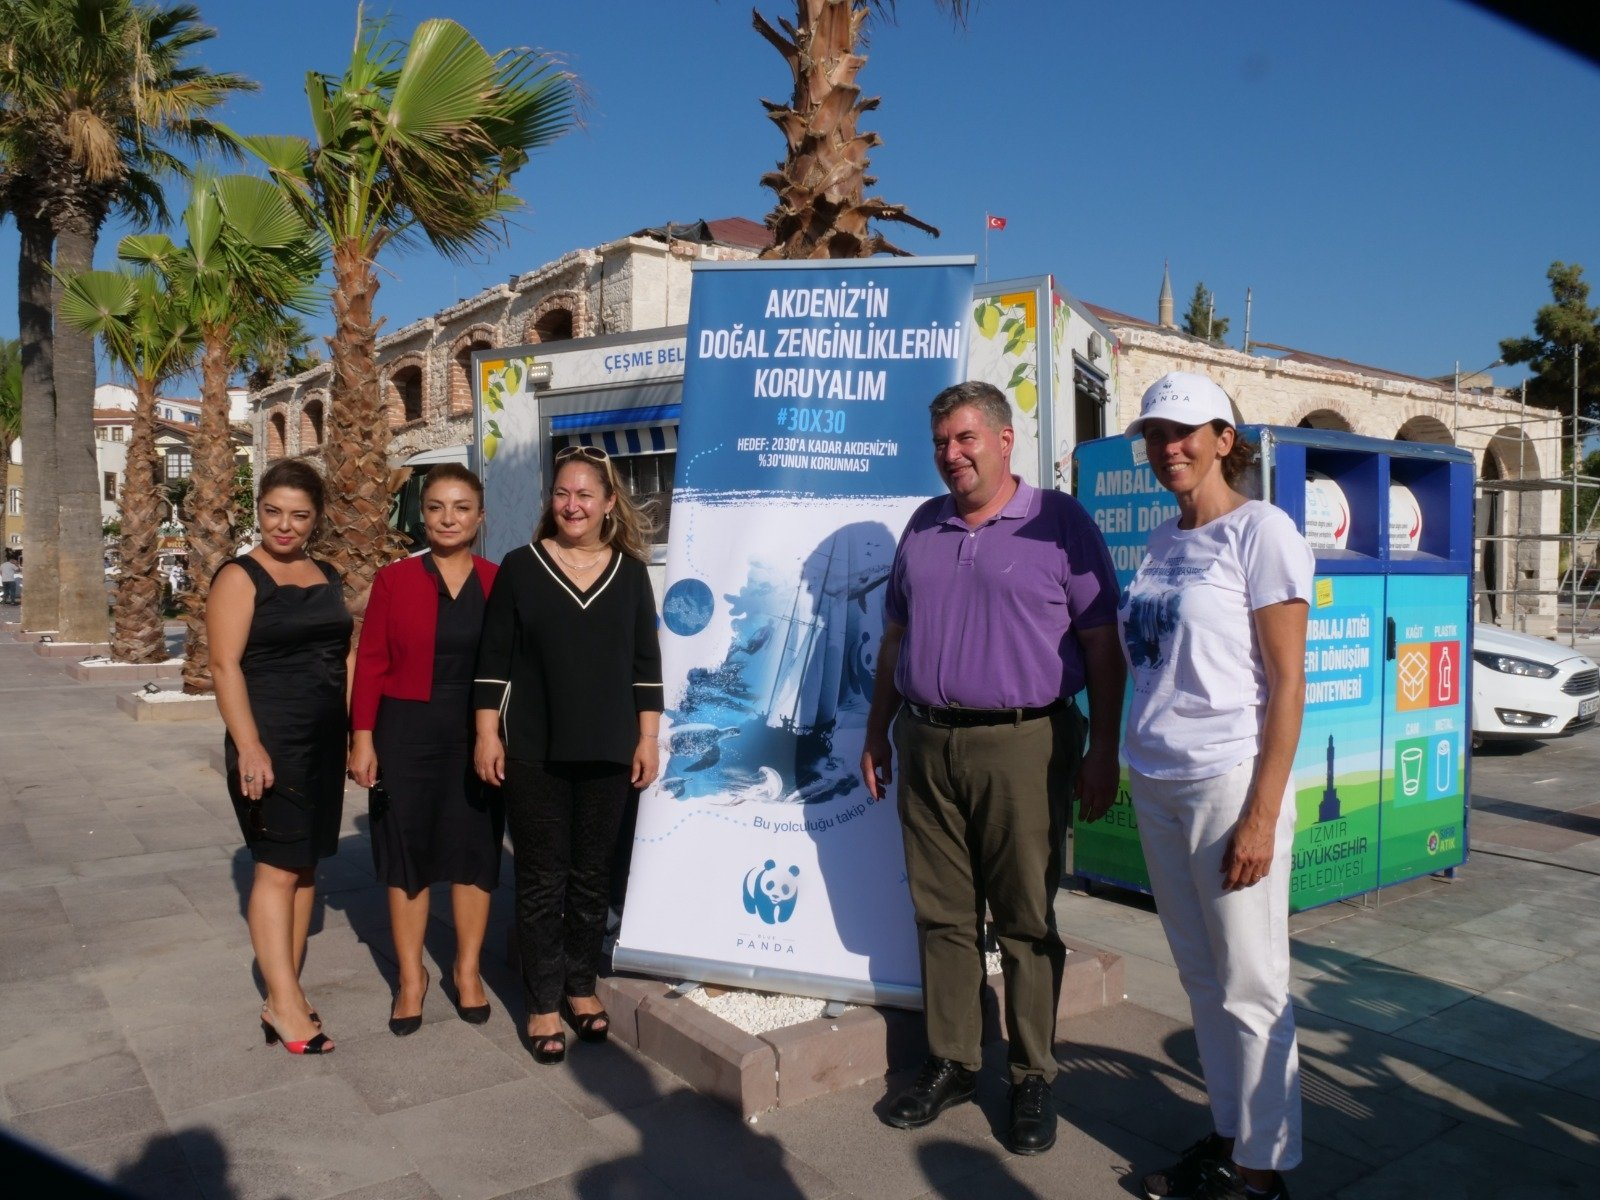 Çeşme Mayor MuammerEkrem Oran announced the Izmir district's new action plan for fighting plastic waste.